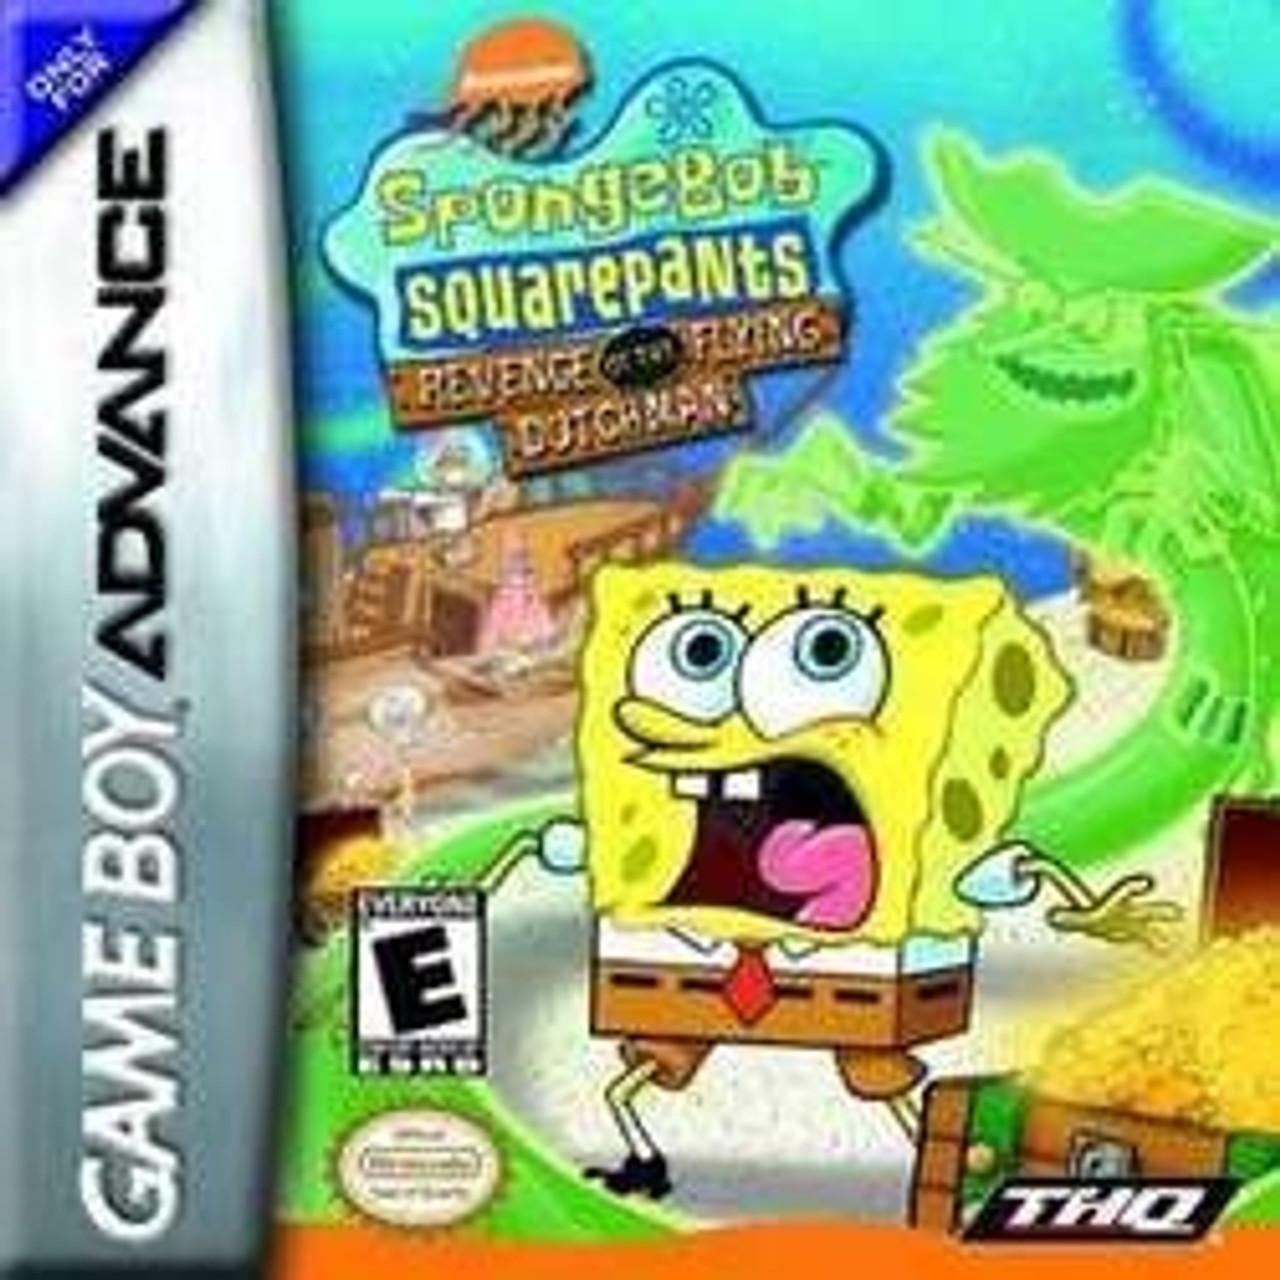 SpongeBob SquarePants Revenge Of The Flying Dutchman - Game Boy Advance Game